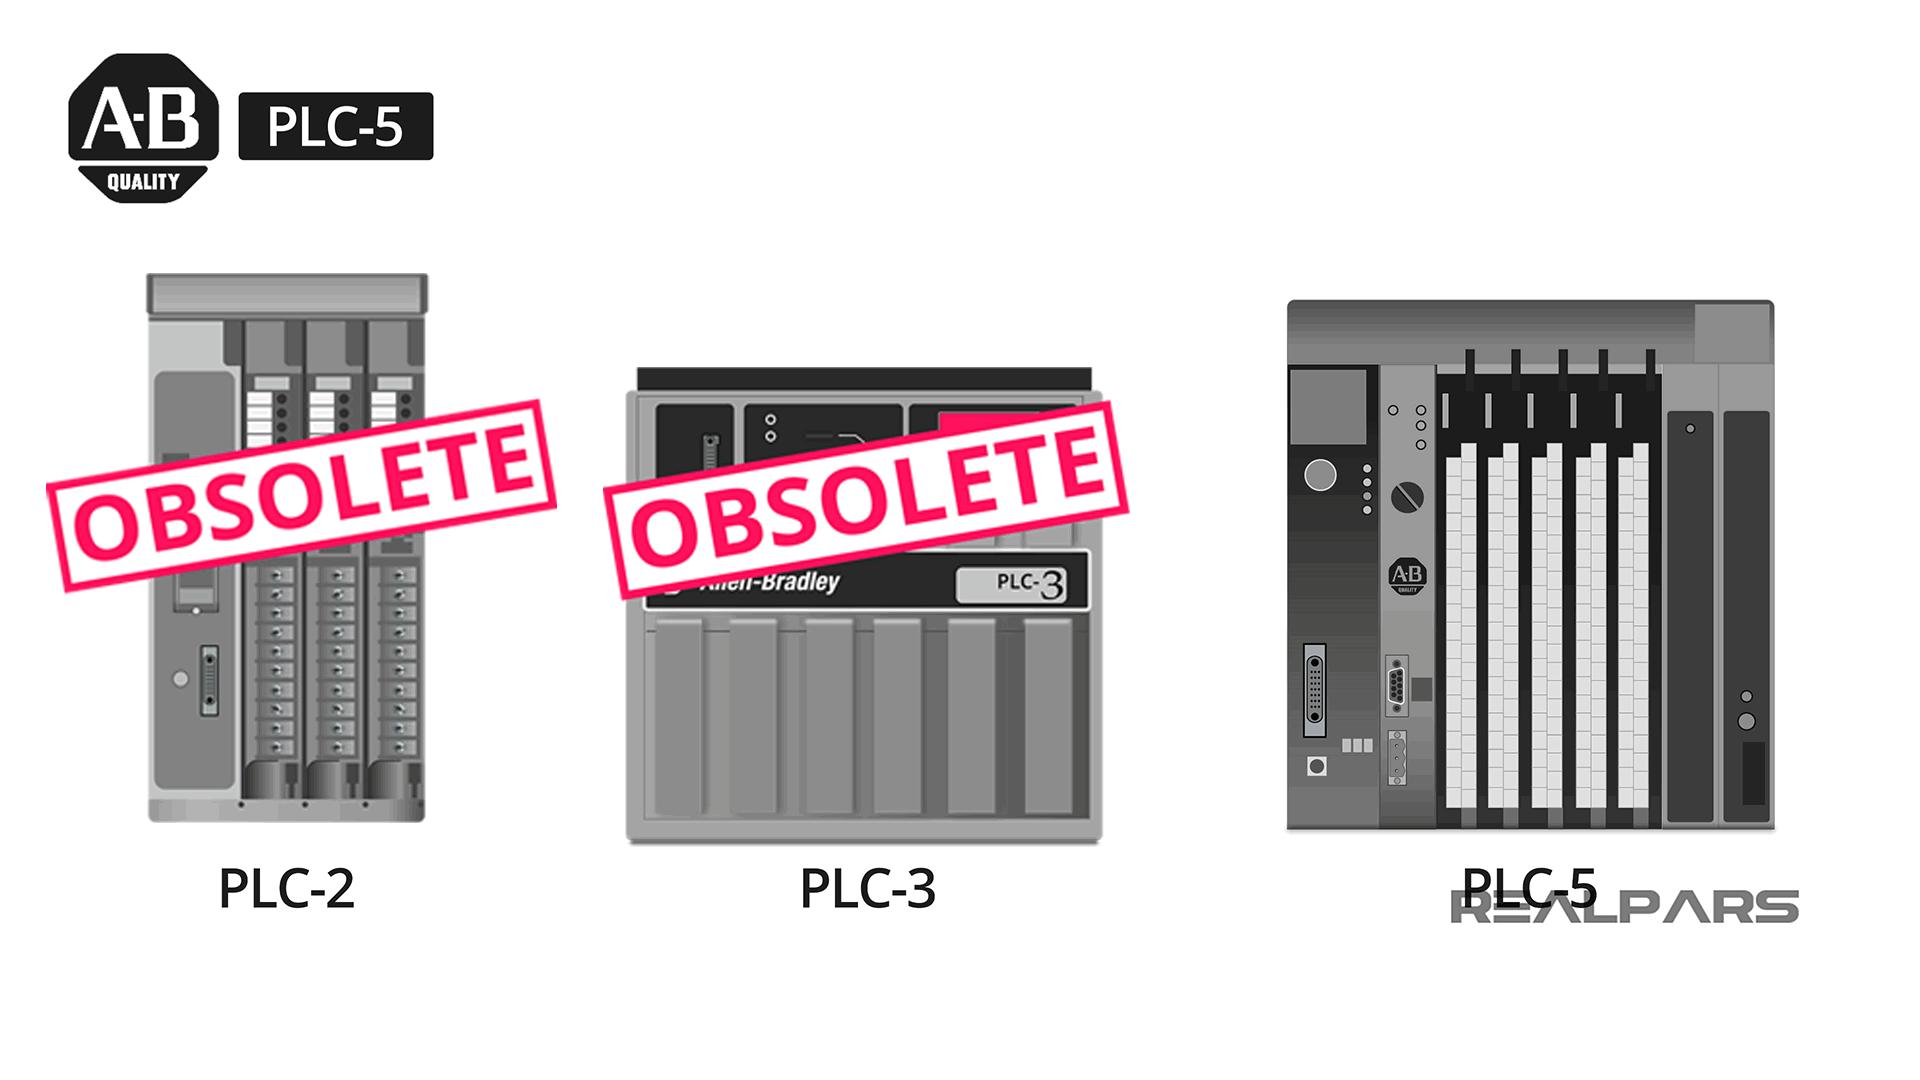 AB PLC-3 and PLC-2